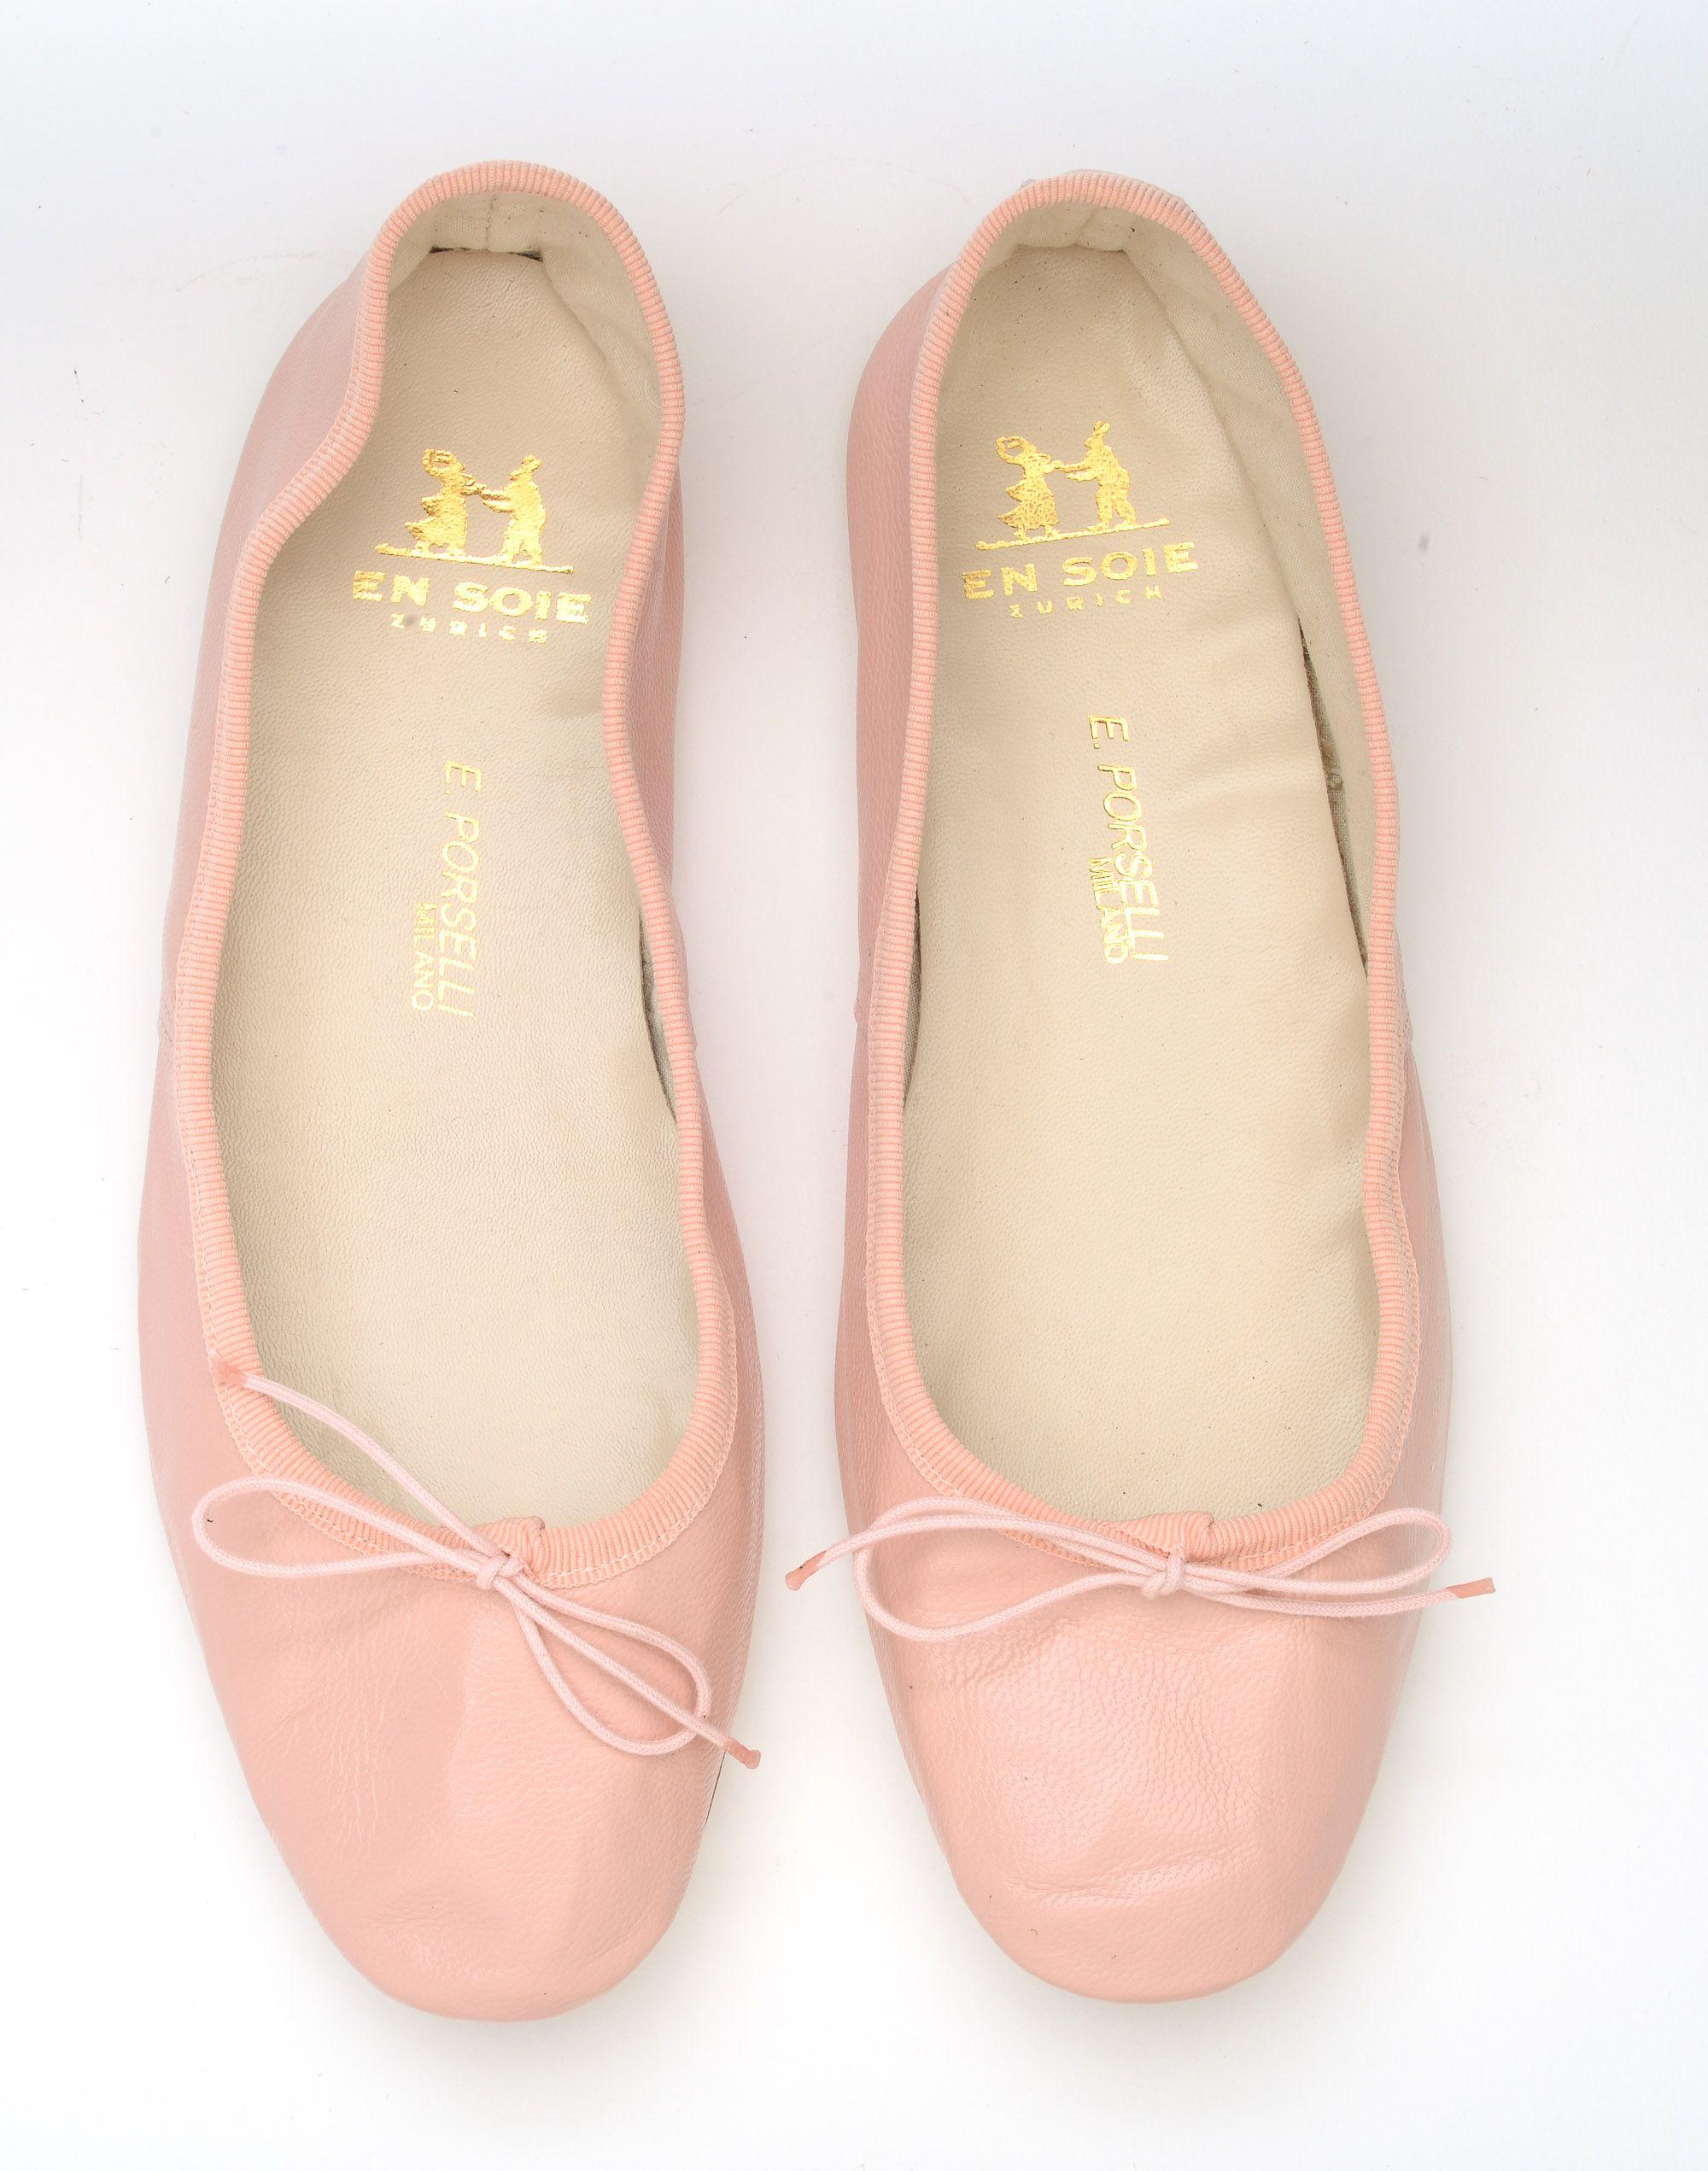 pink porselli ballet flats en soie shoes pinterest pink